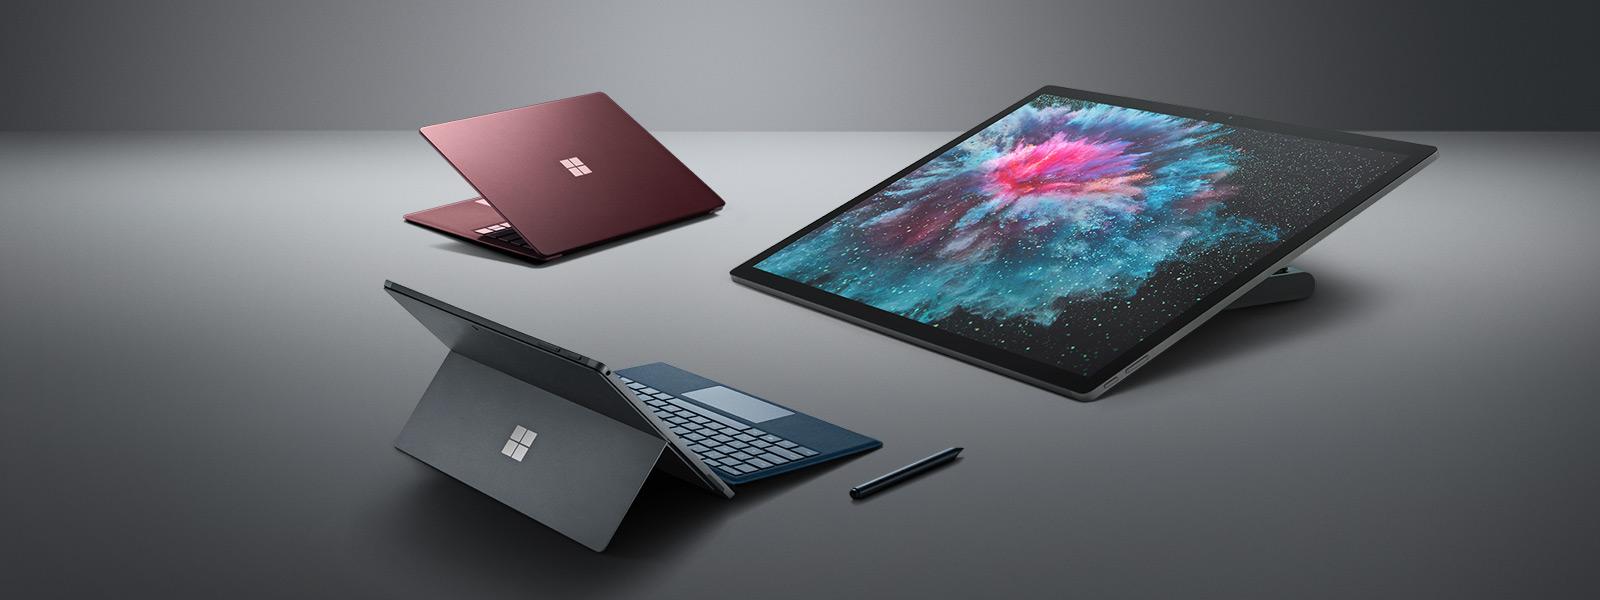 Surface Laptop 2, Surface Pro 6,Surface Studio 2